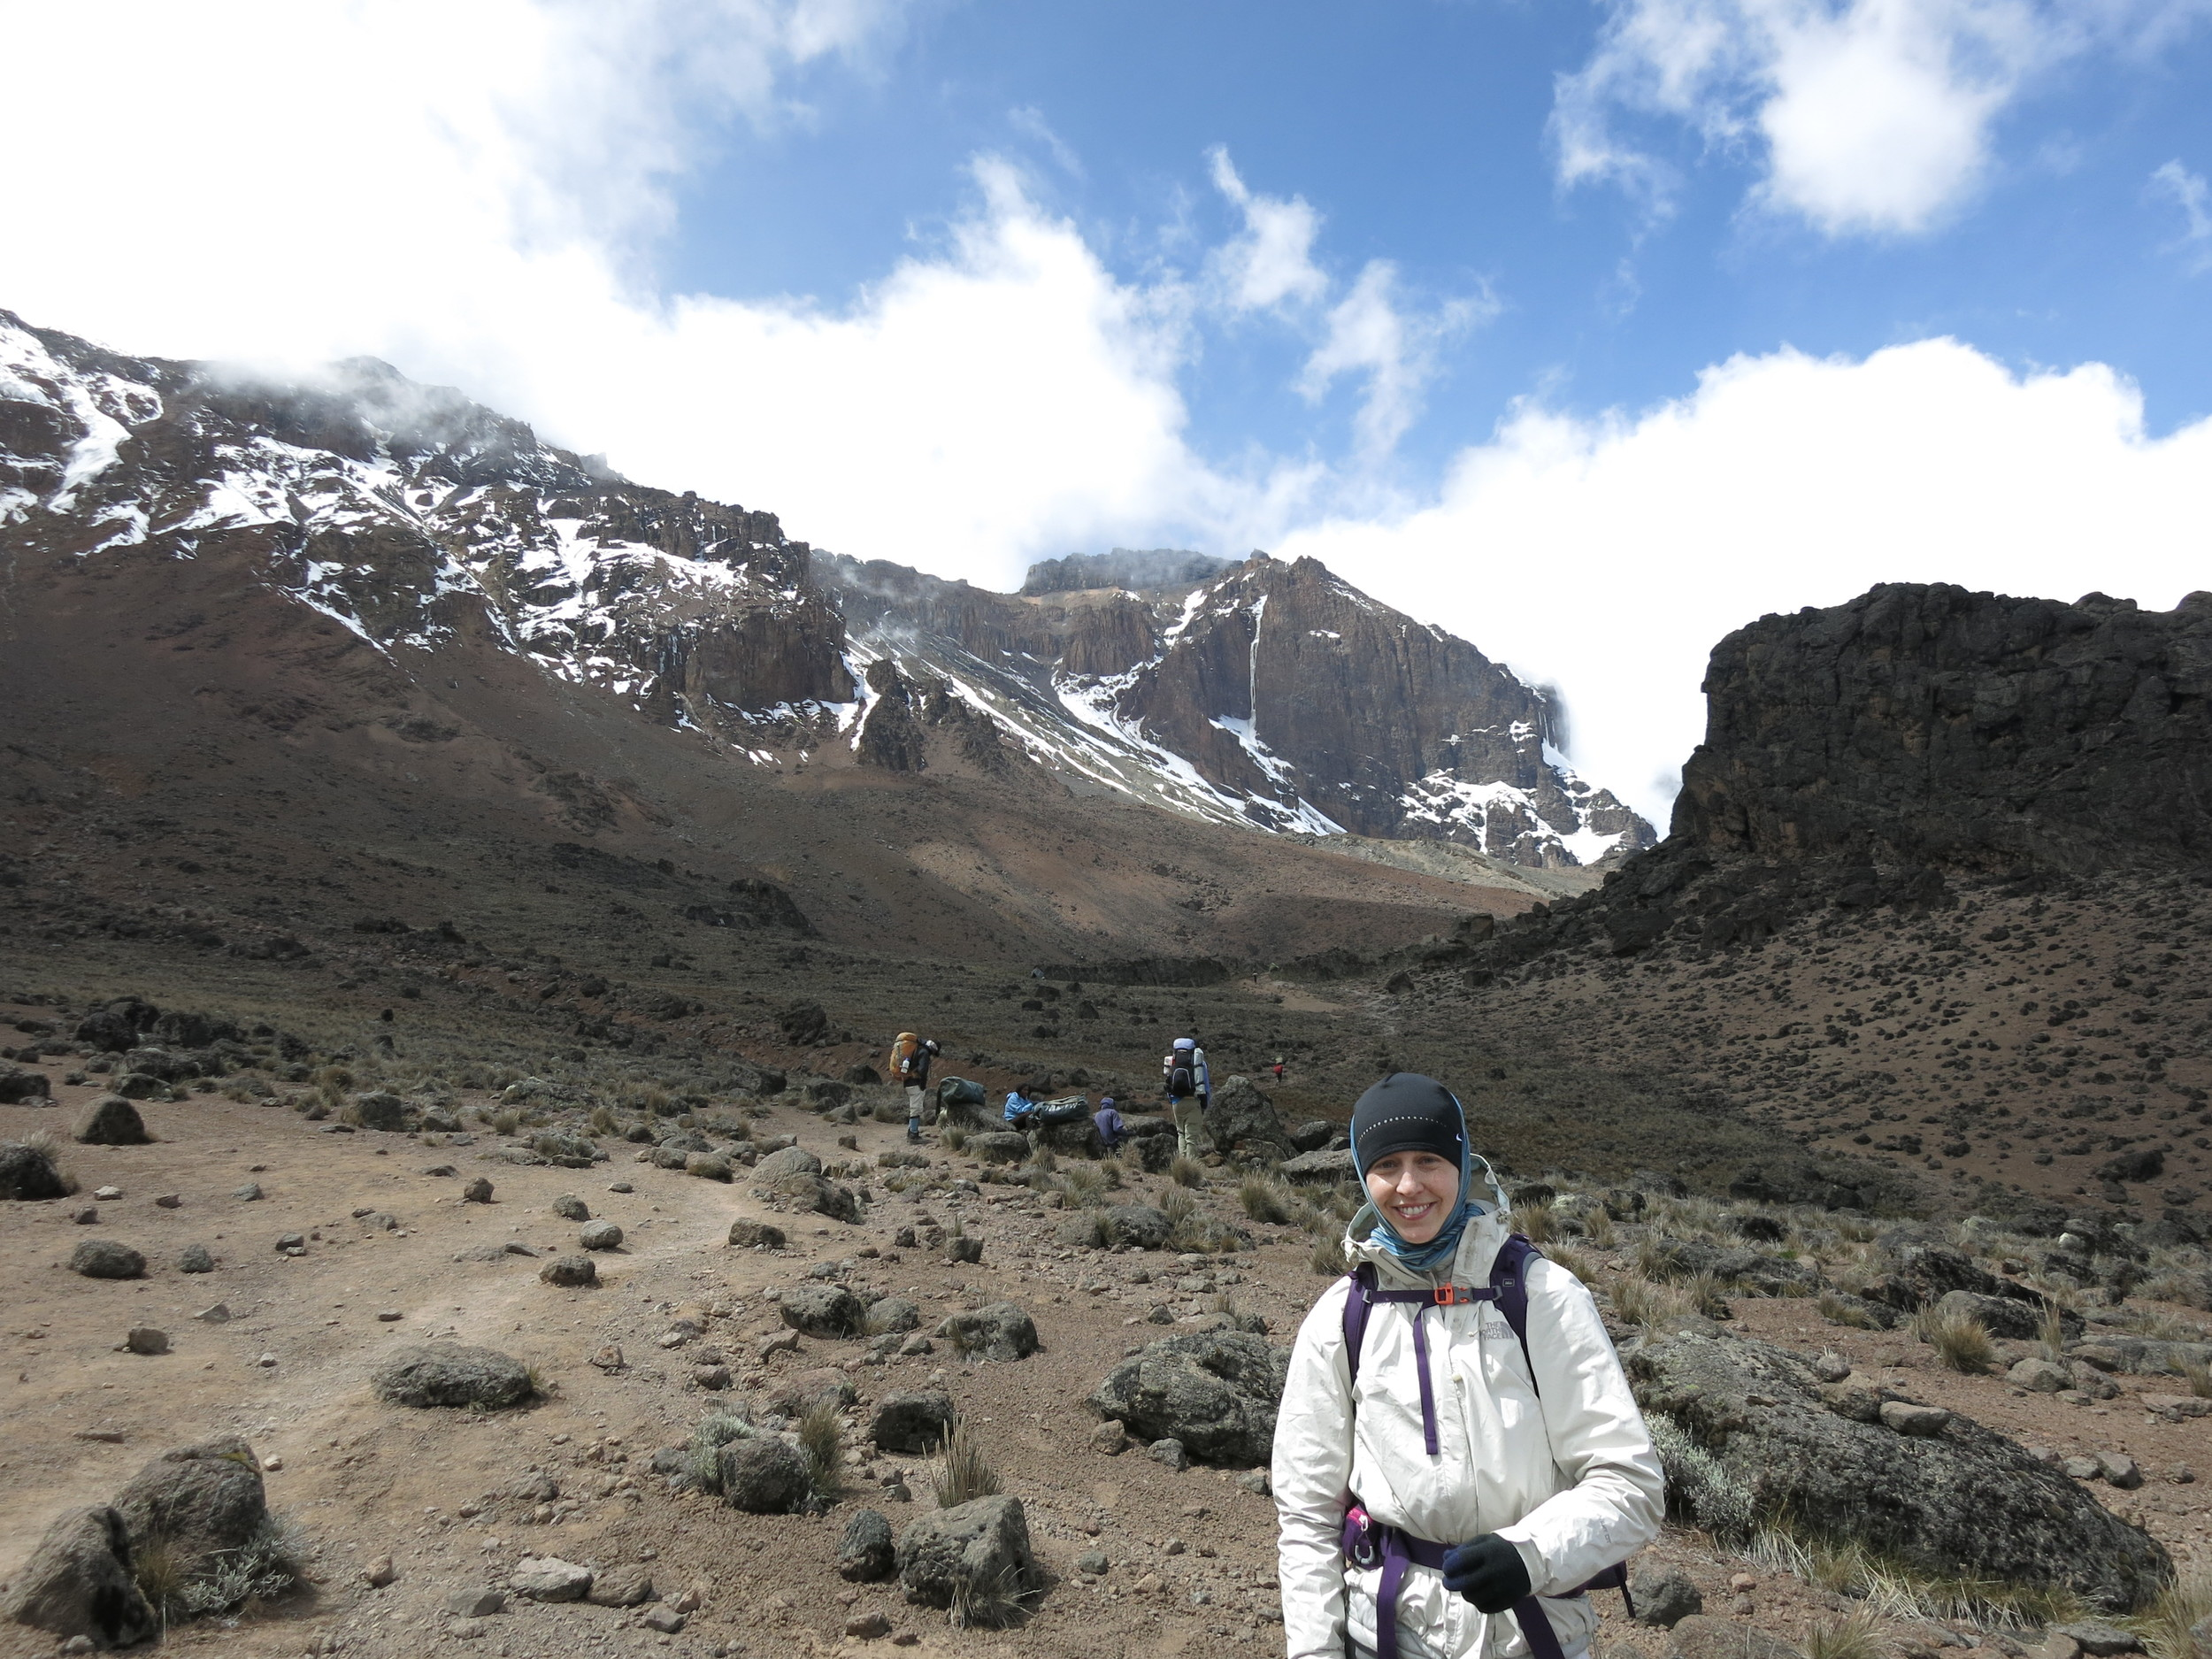 kaitlin-gregg-goodman-mt-kilimanjaro